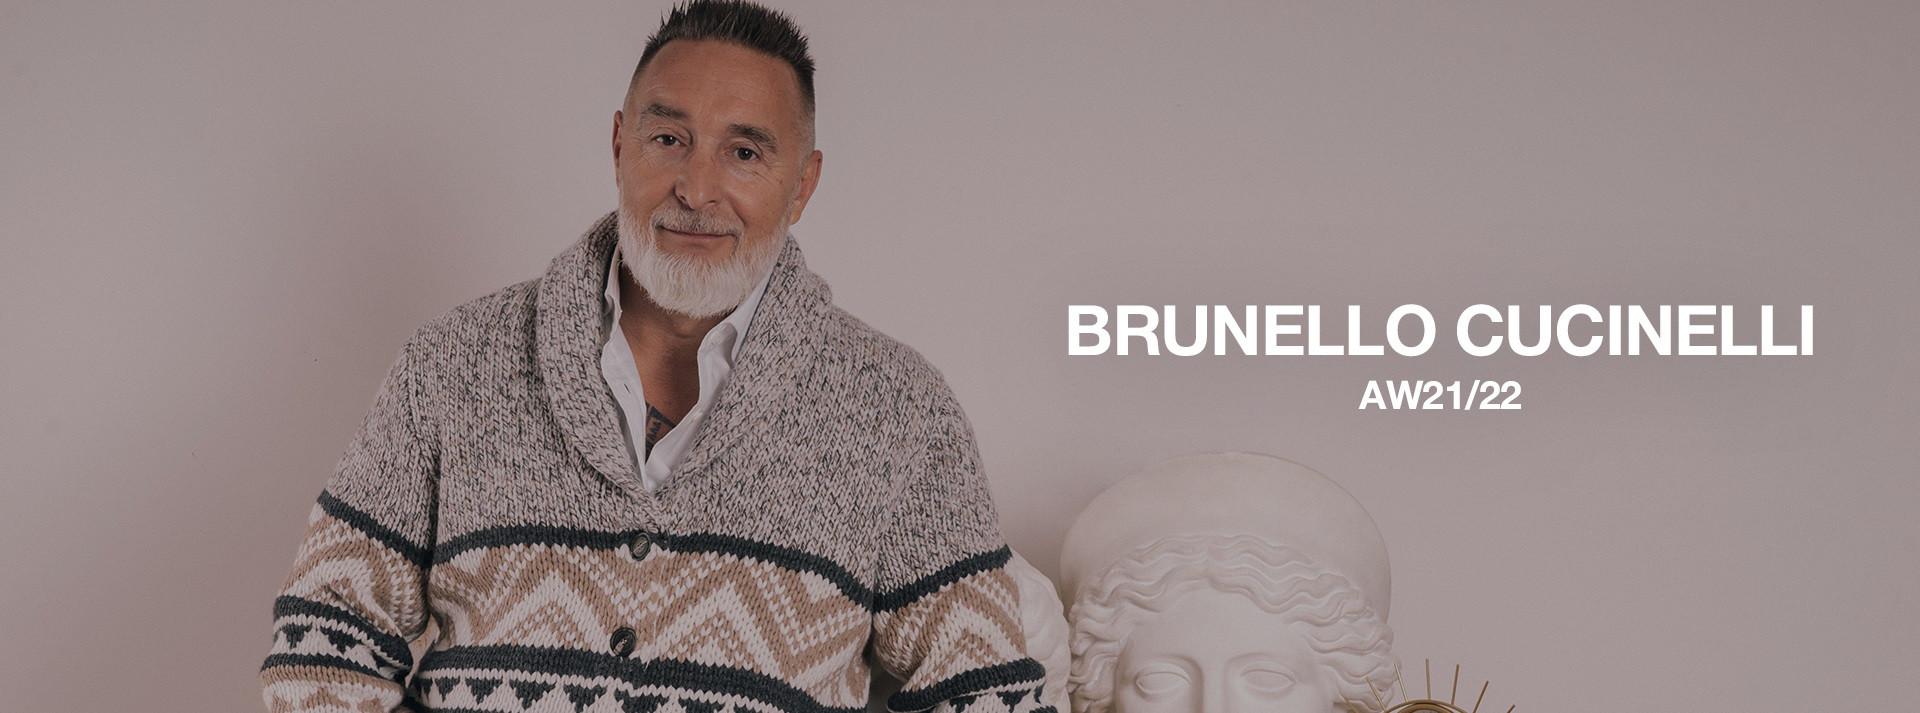 aw_brunellocucinelli